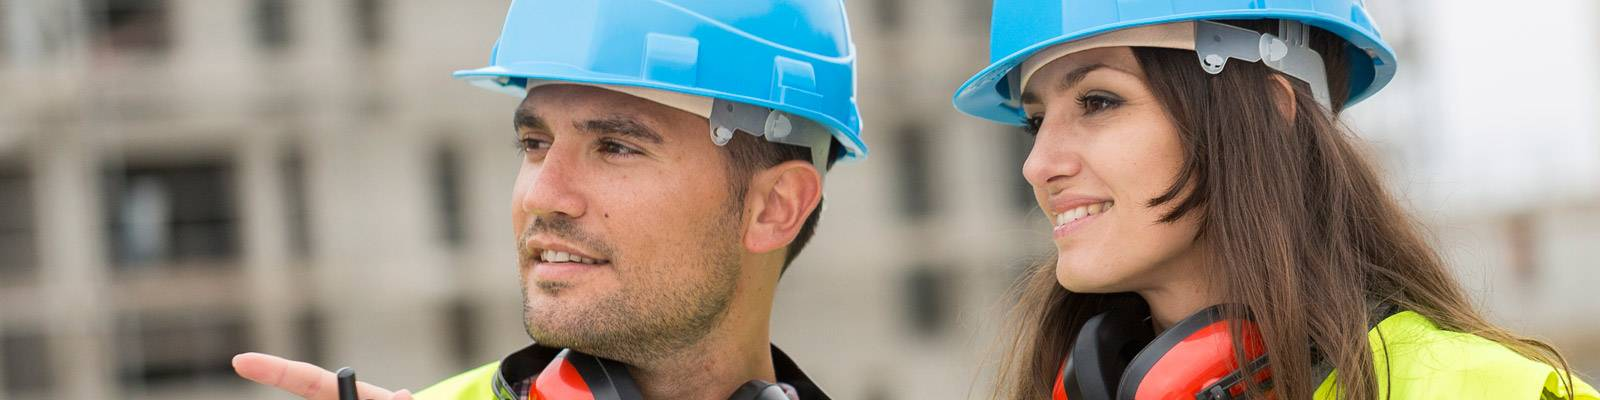 cosntruction-workers-in-blue-hard-hats.jpg